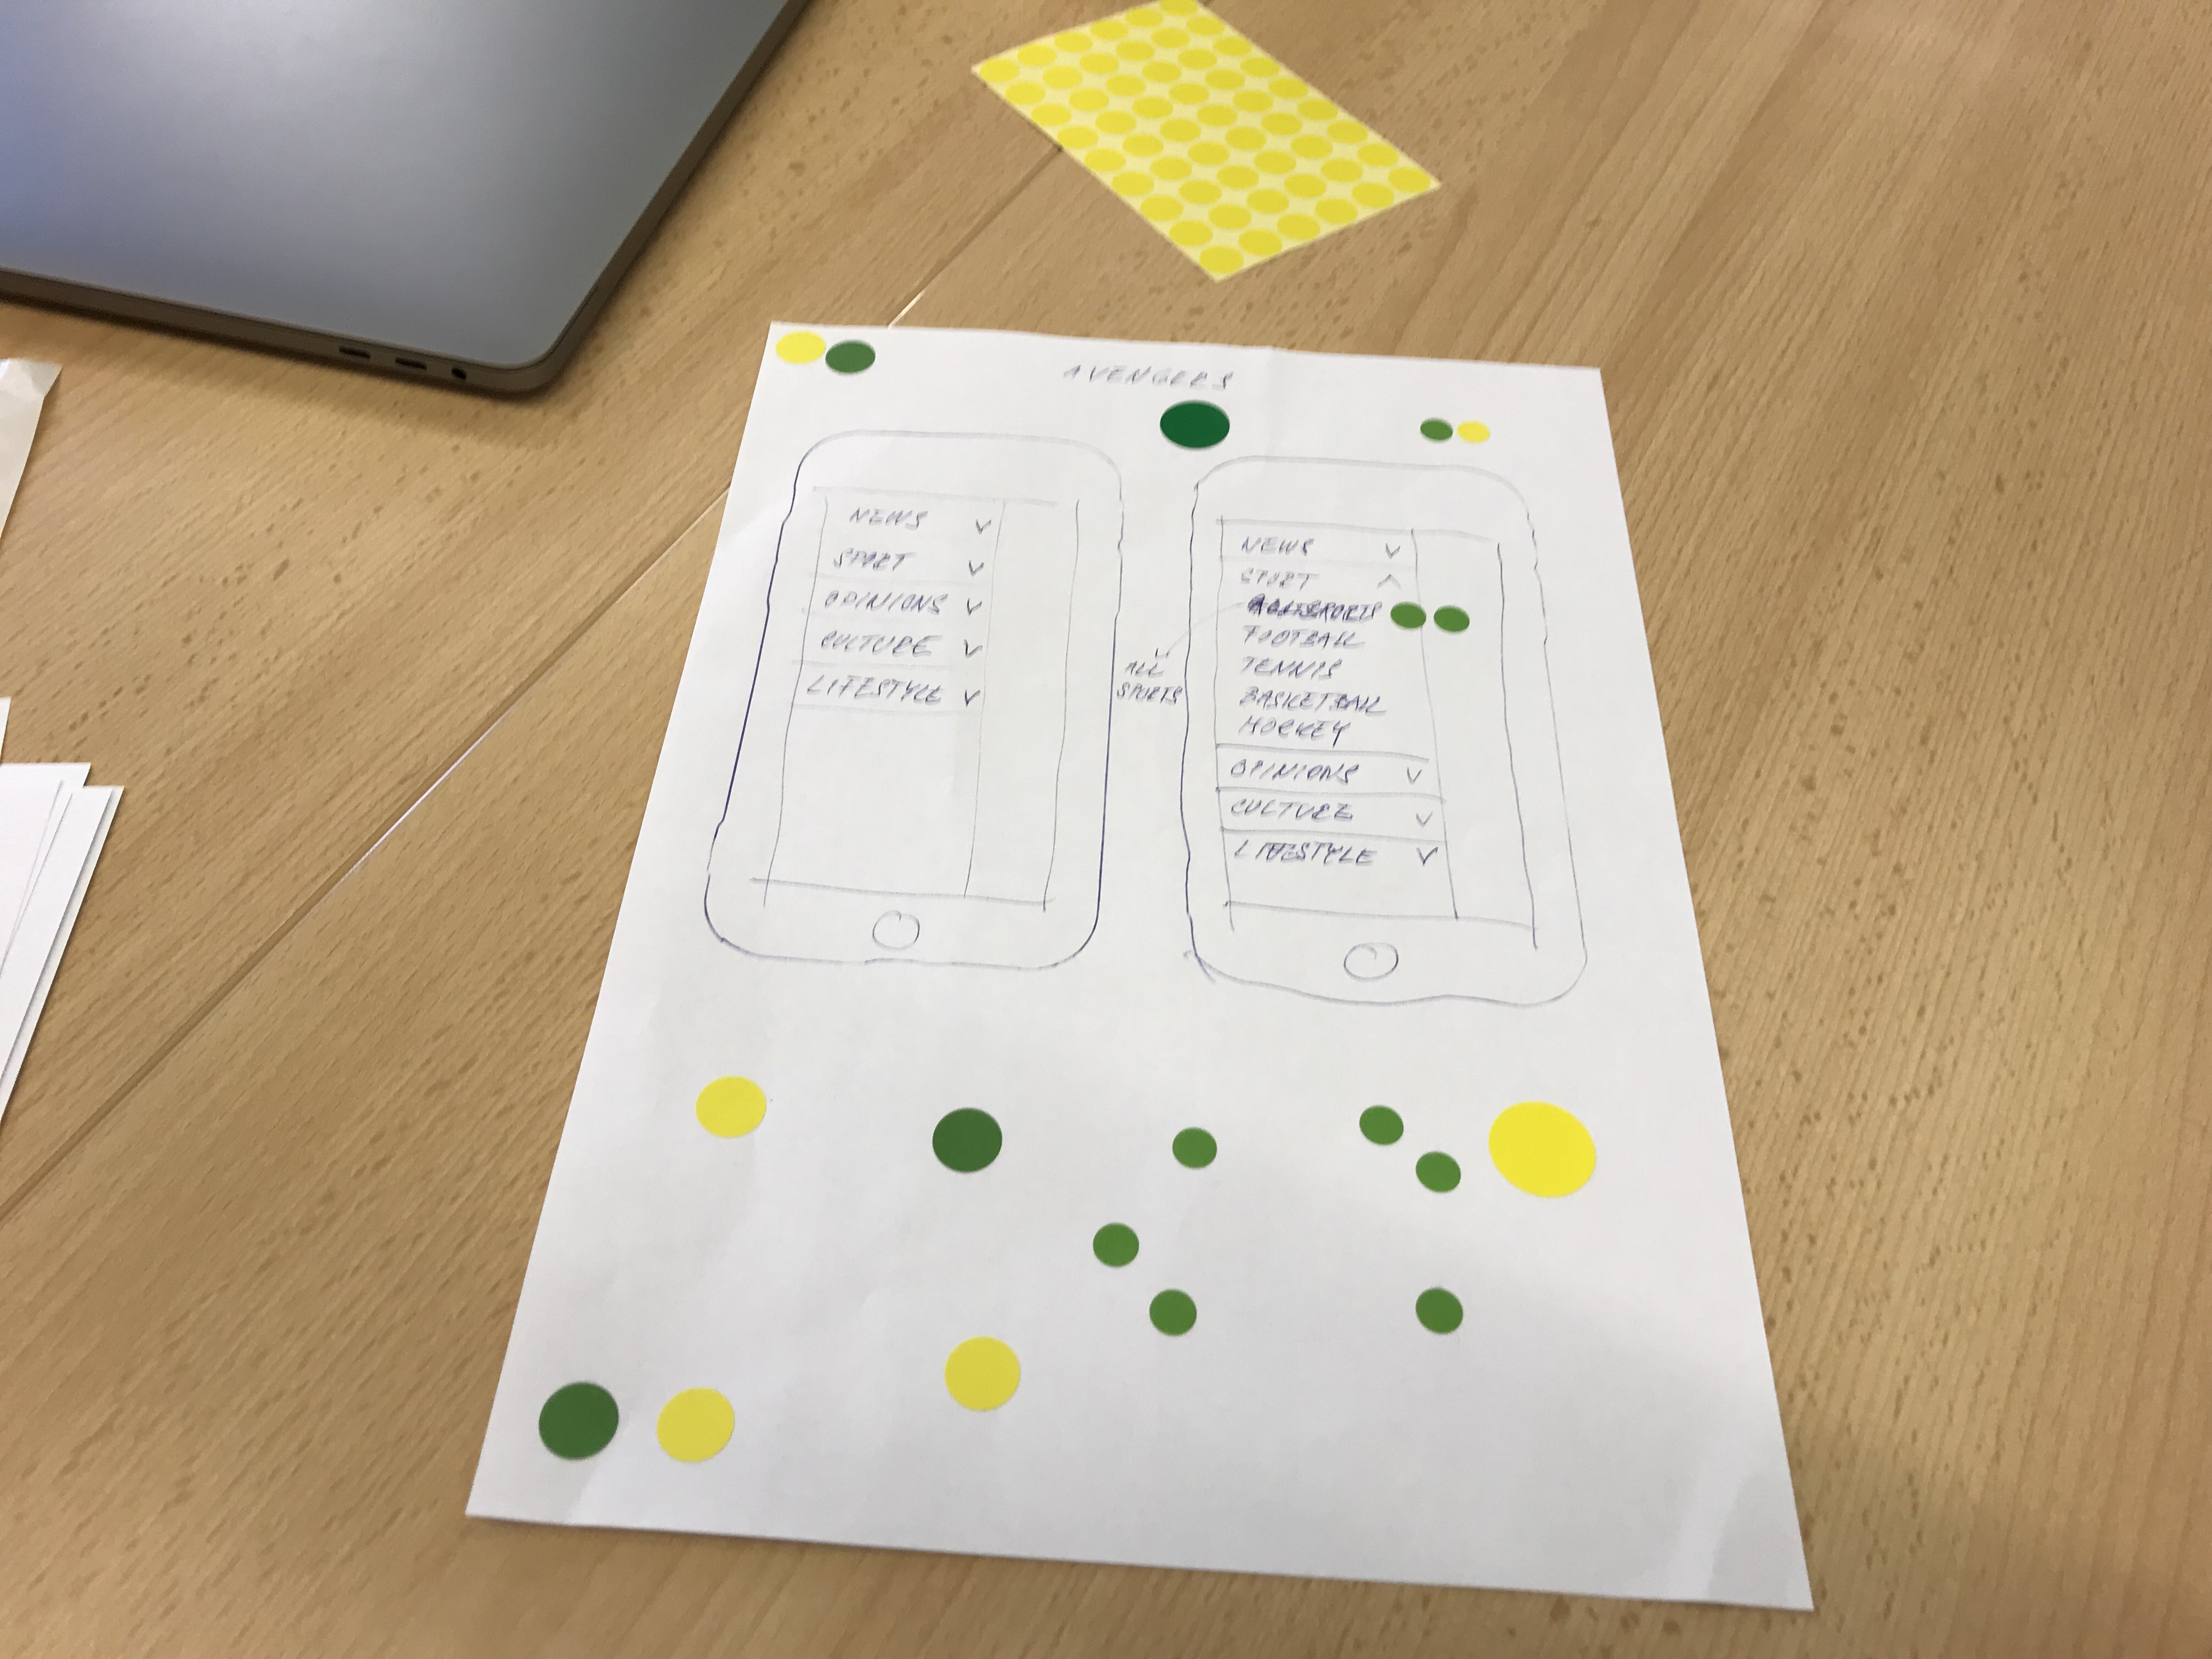 Workshop Smart responsive interface